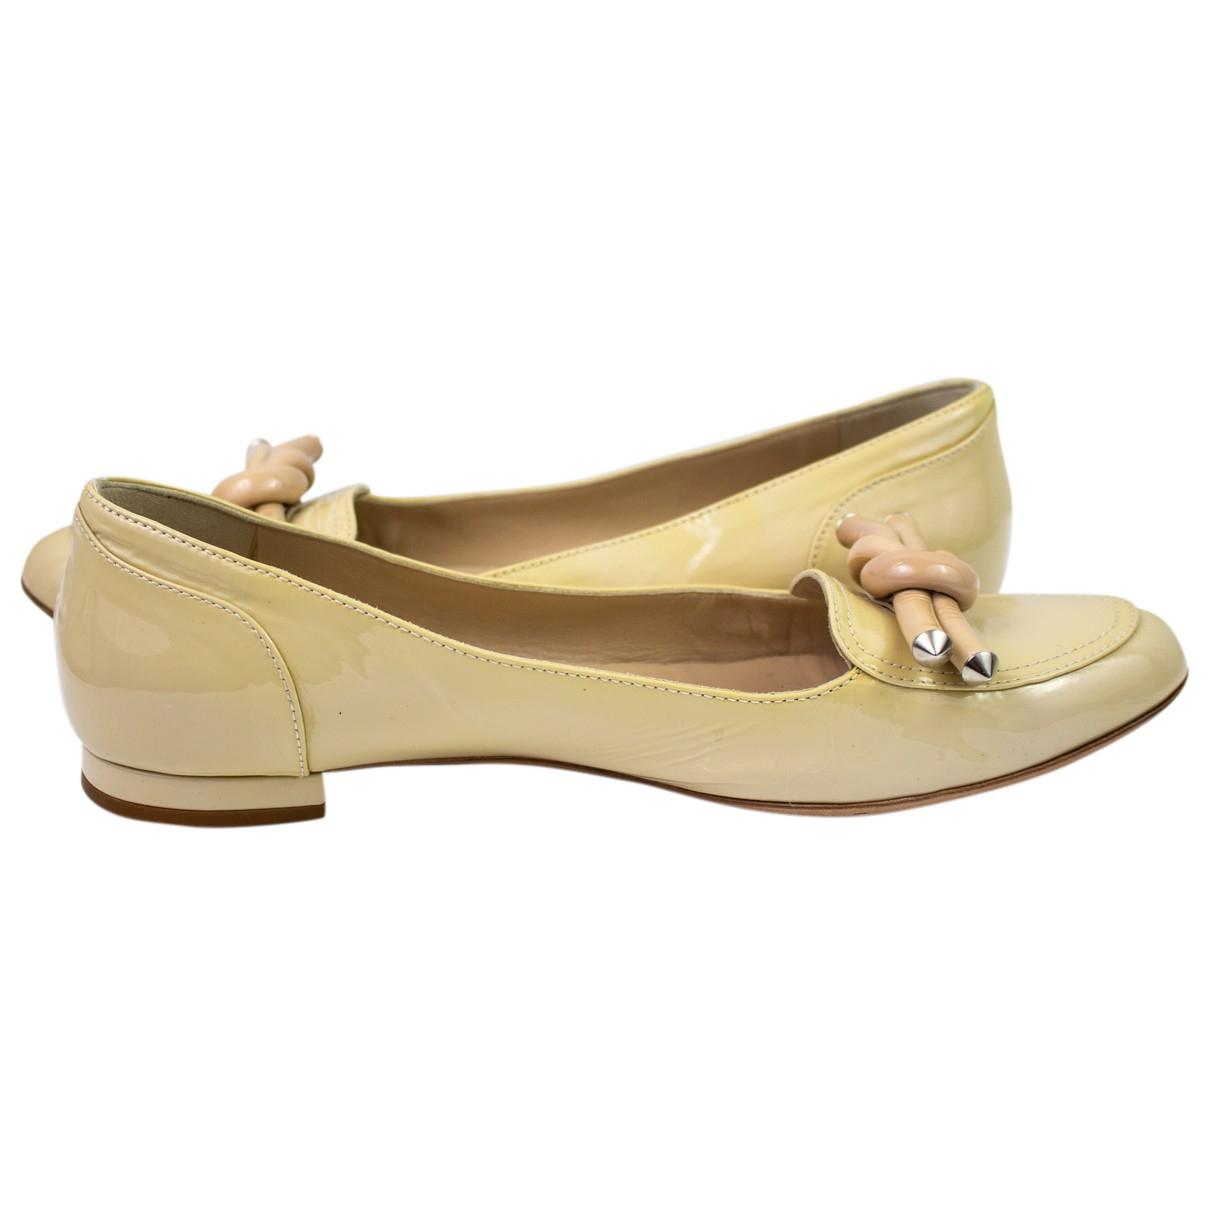 Balenciaga - Mocassins   pour femme en cuir verni - beige